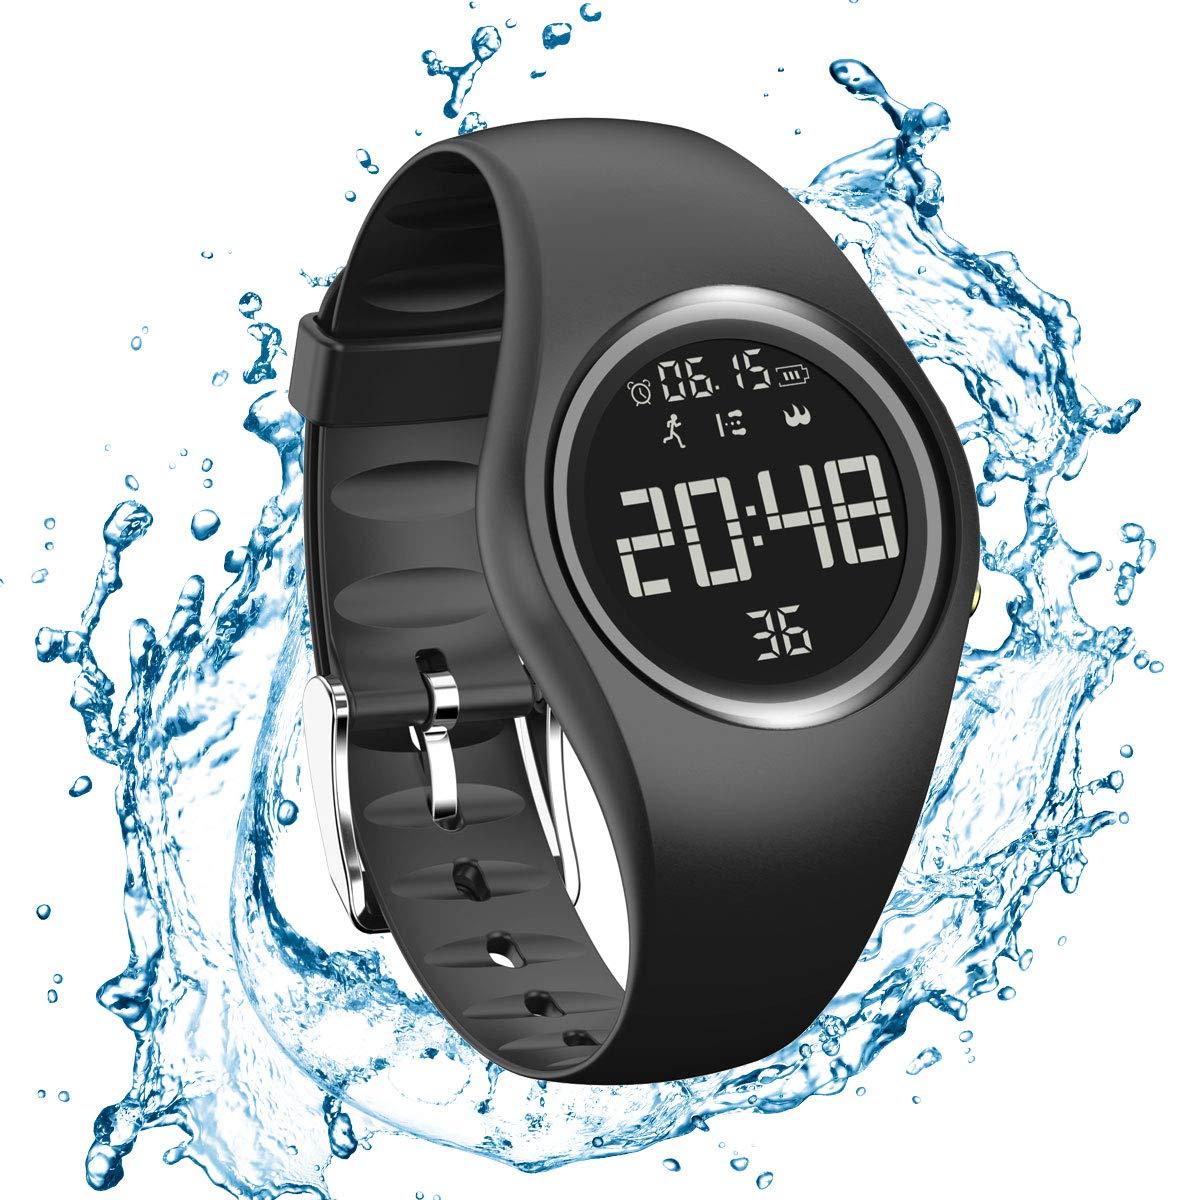 RCruning-EU Pulsera Actividad Impermeable IP68 Fitness Smartwatch Tracker Contador de Pasos, Contador de Calorías… 1